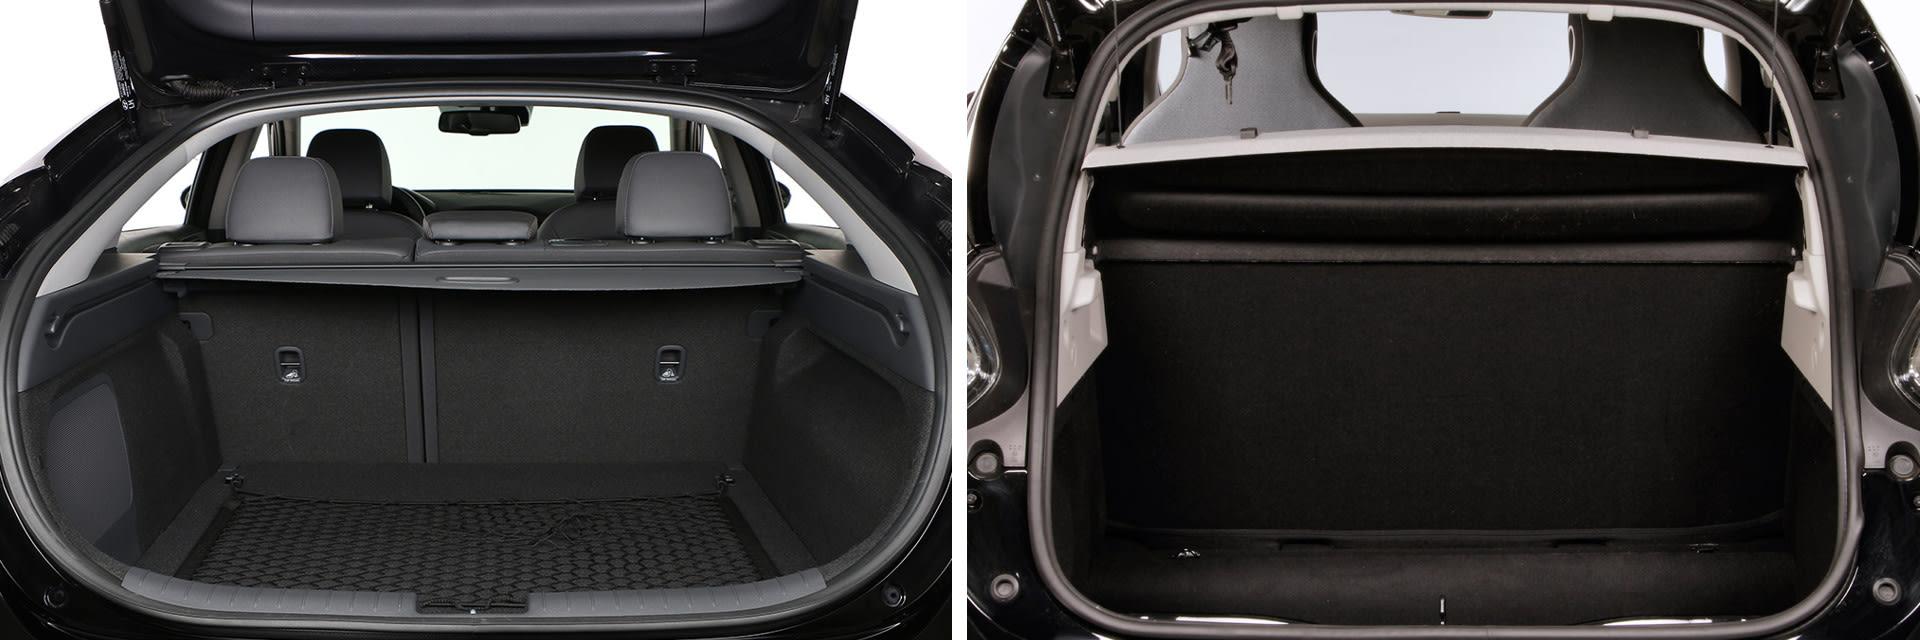 La capacidad de maletero del Hyundai IONIQ (izq.) es de 350 litros. La del Renault ZOE (dcha.) es de 338 litros.